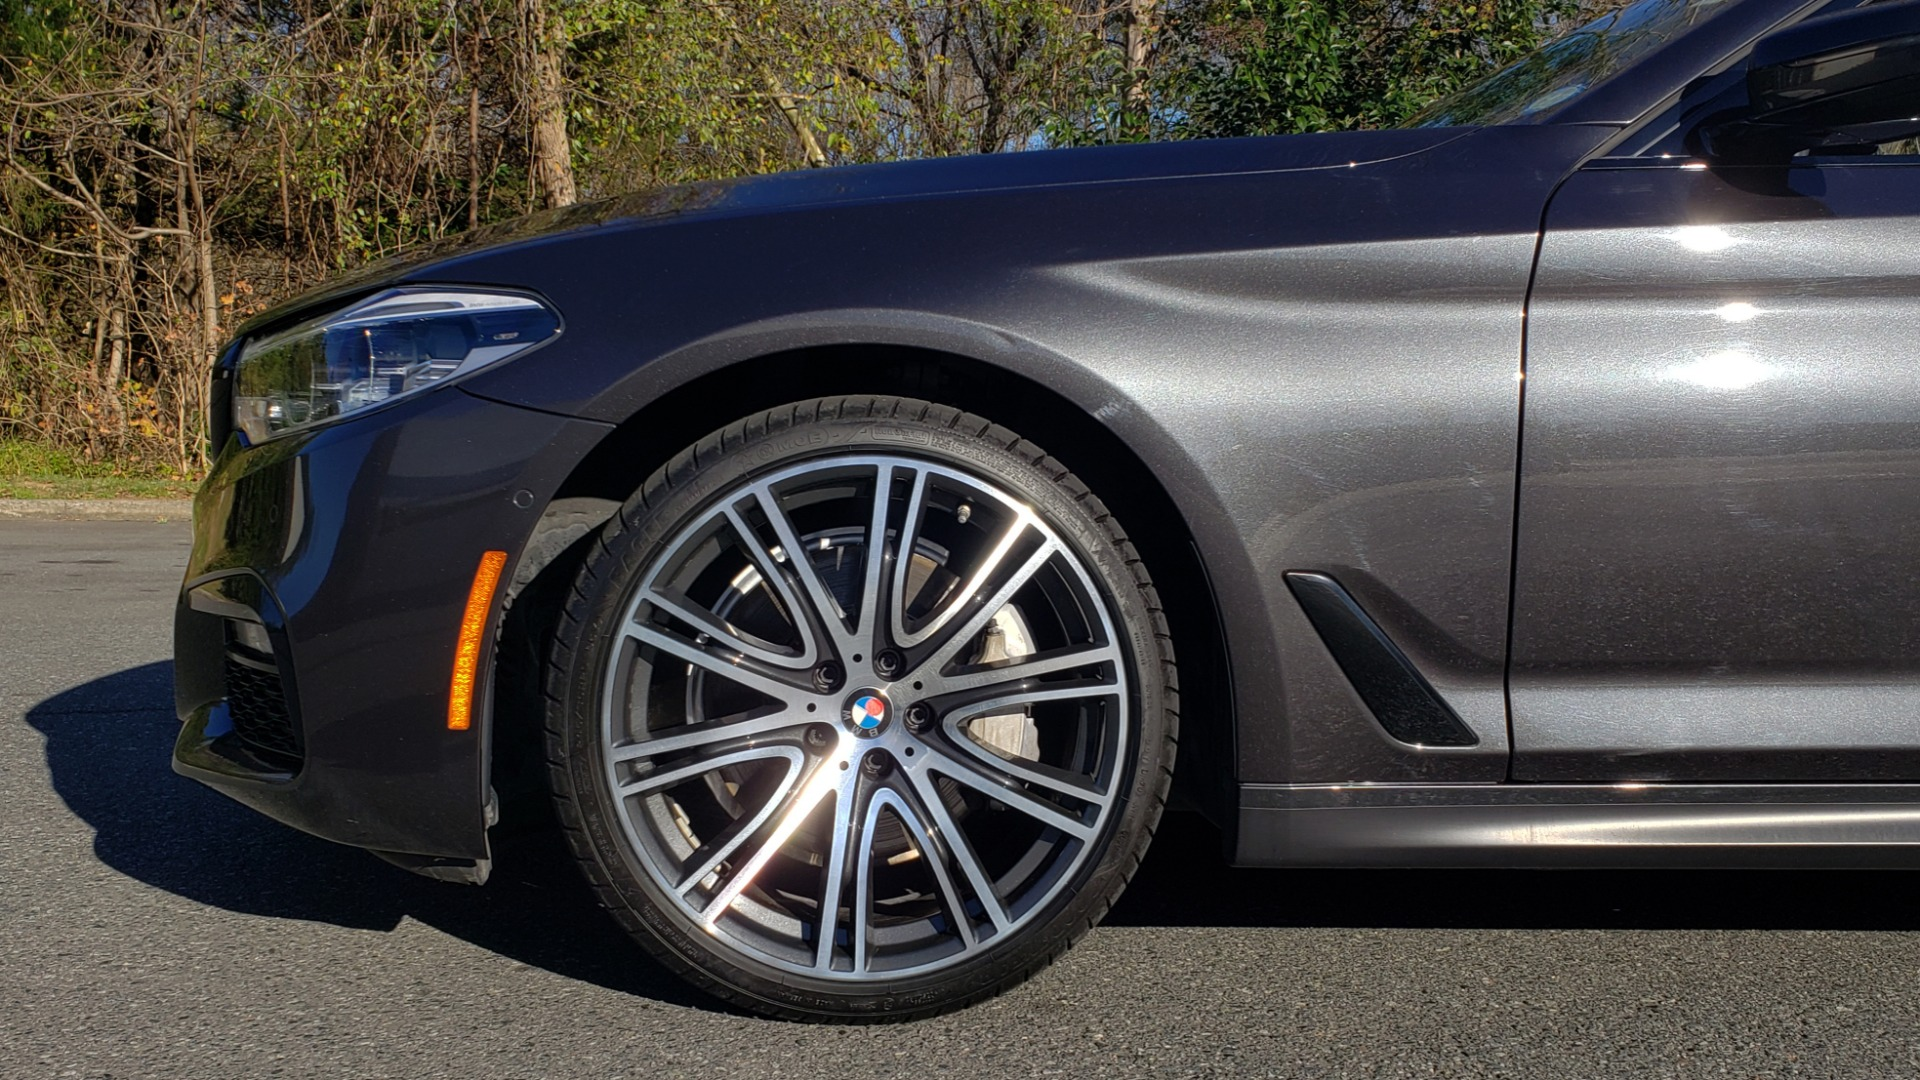 Used 2018 BMW 5 SERIES 540I M-SPORT / DRVR ASST / EXEC PKG / NAV / SUNROOF / HUD / REARVIEW for sale Sold at Formula Imports in Charlotte NC 28227 78